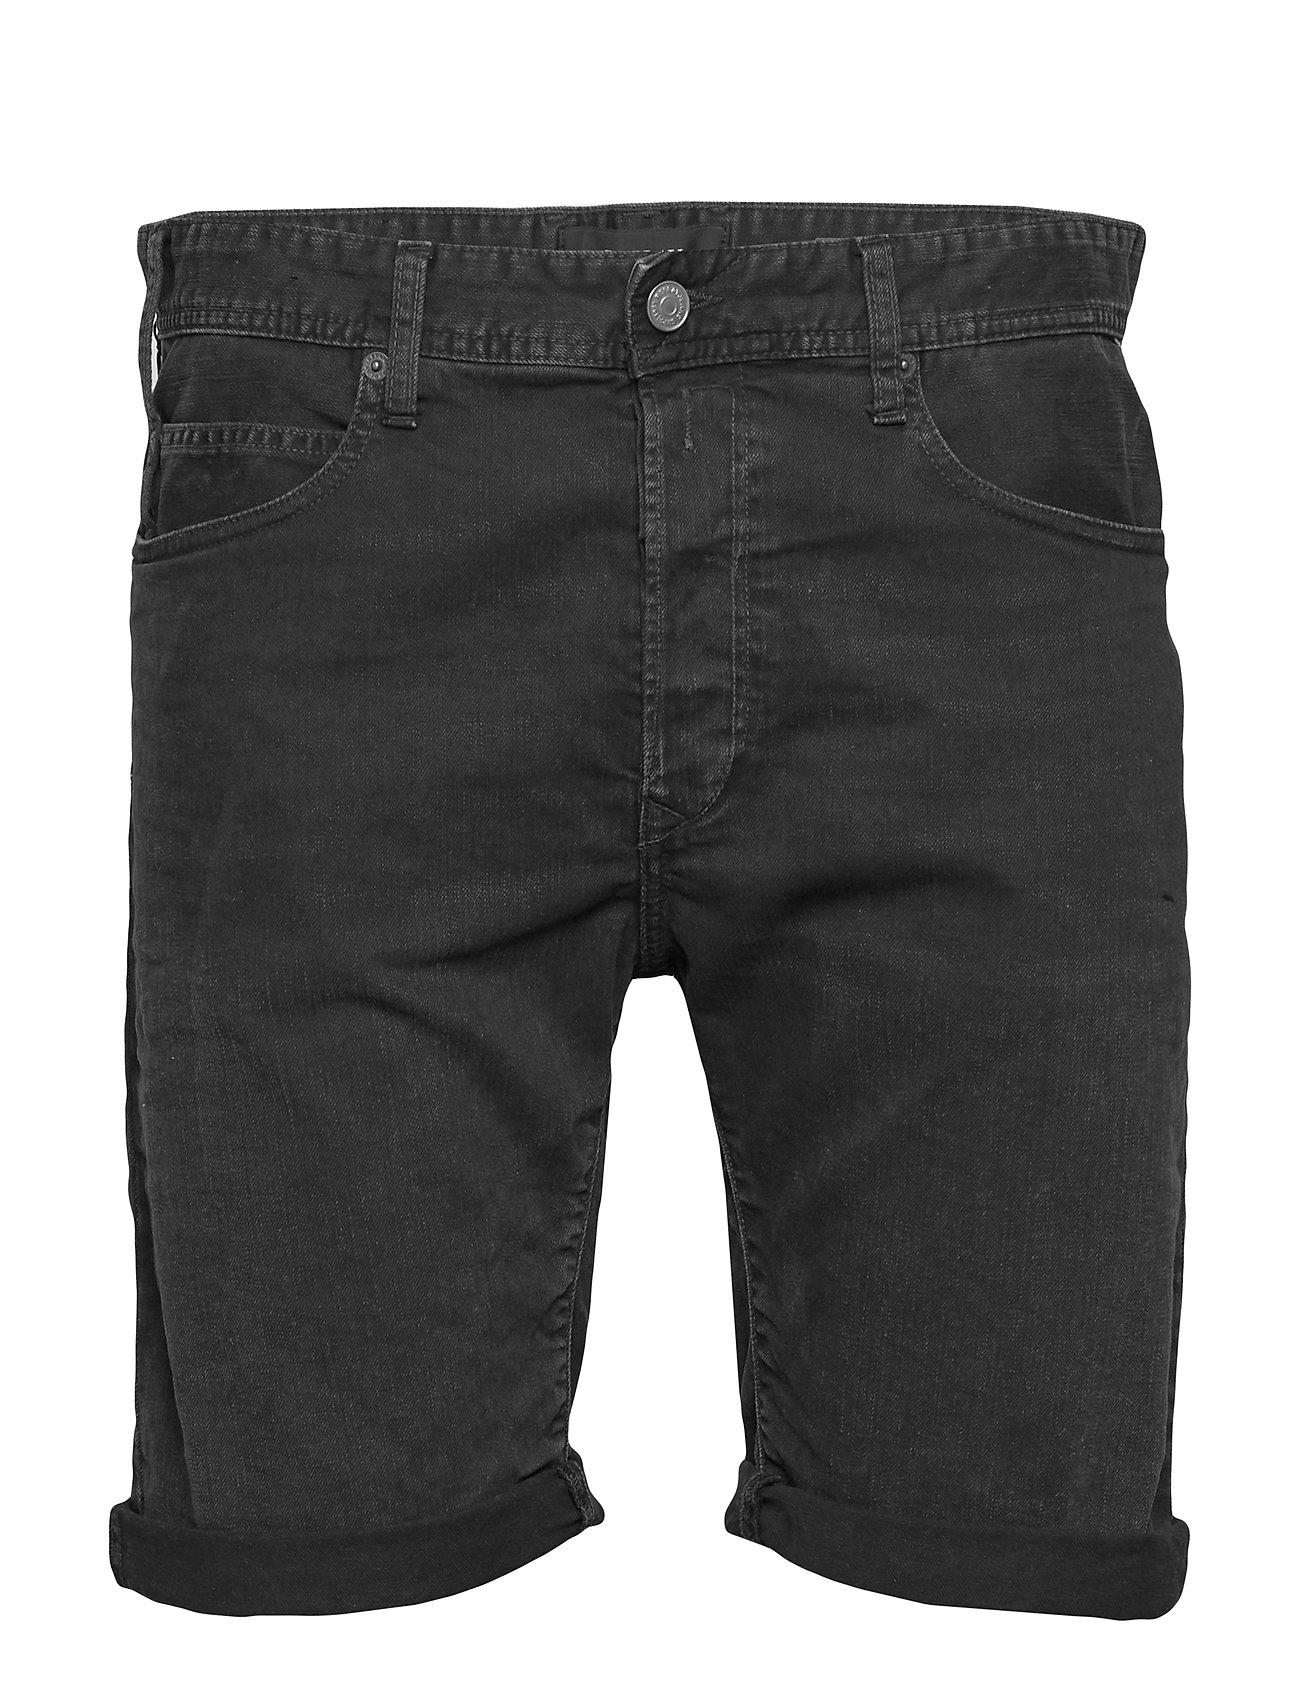 Replay - RBJ.901 SHORT - denim shorts - black delavÈ - 0